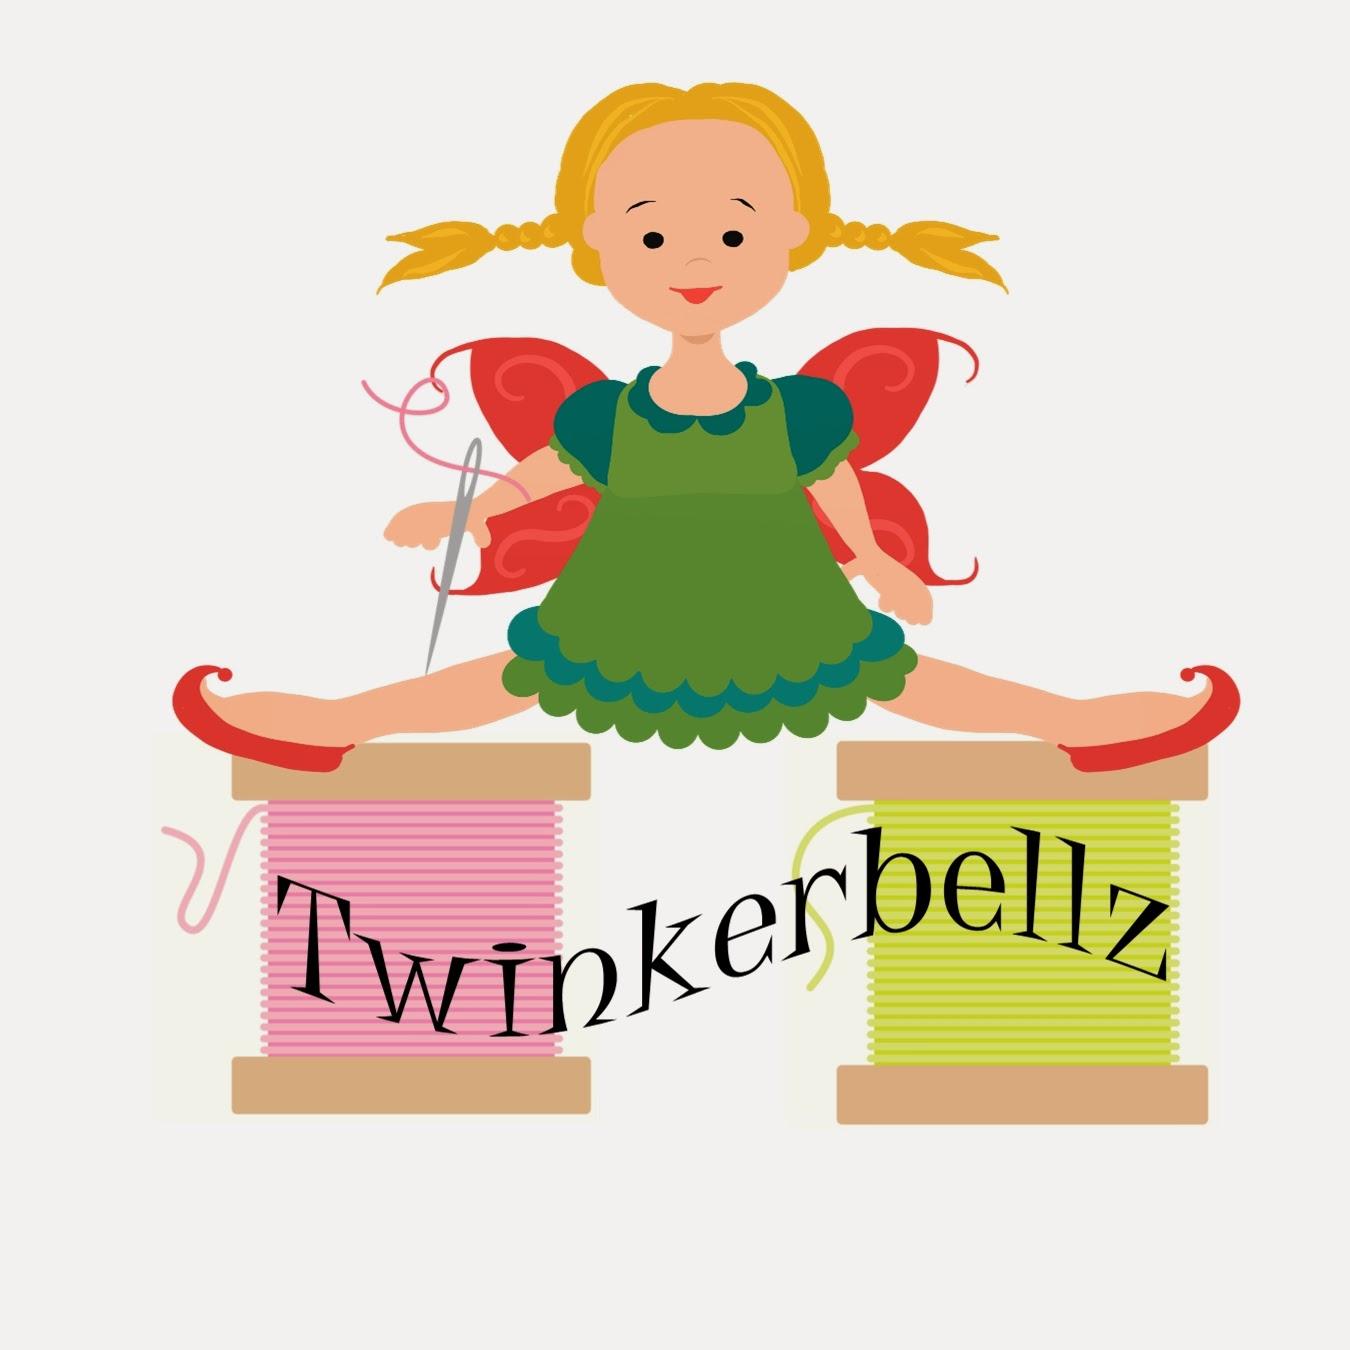 Twinkerbellz Designs